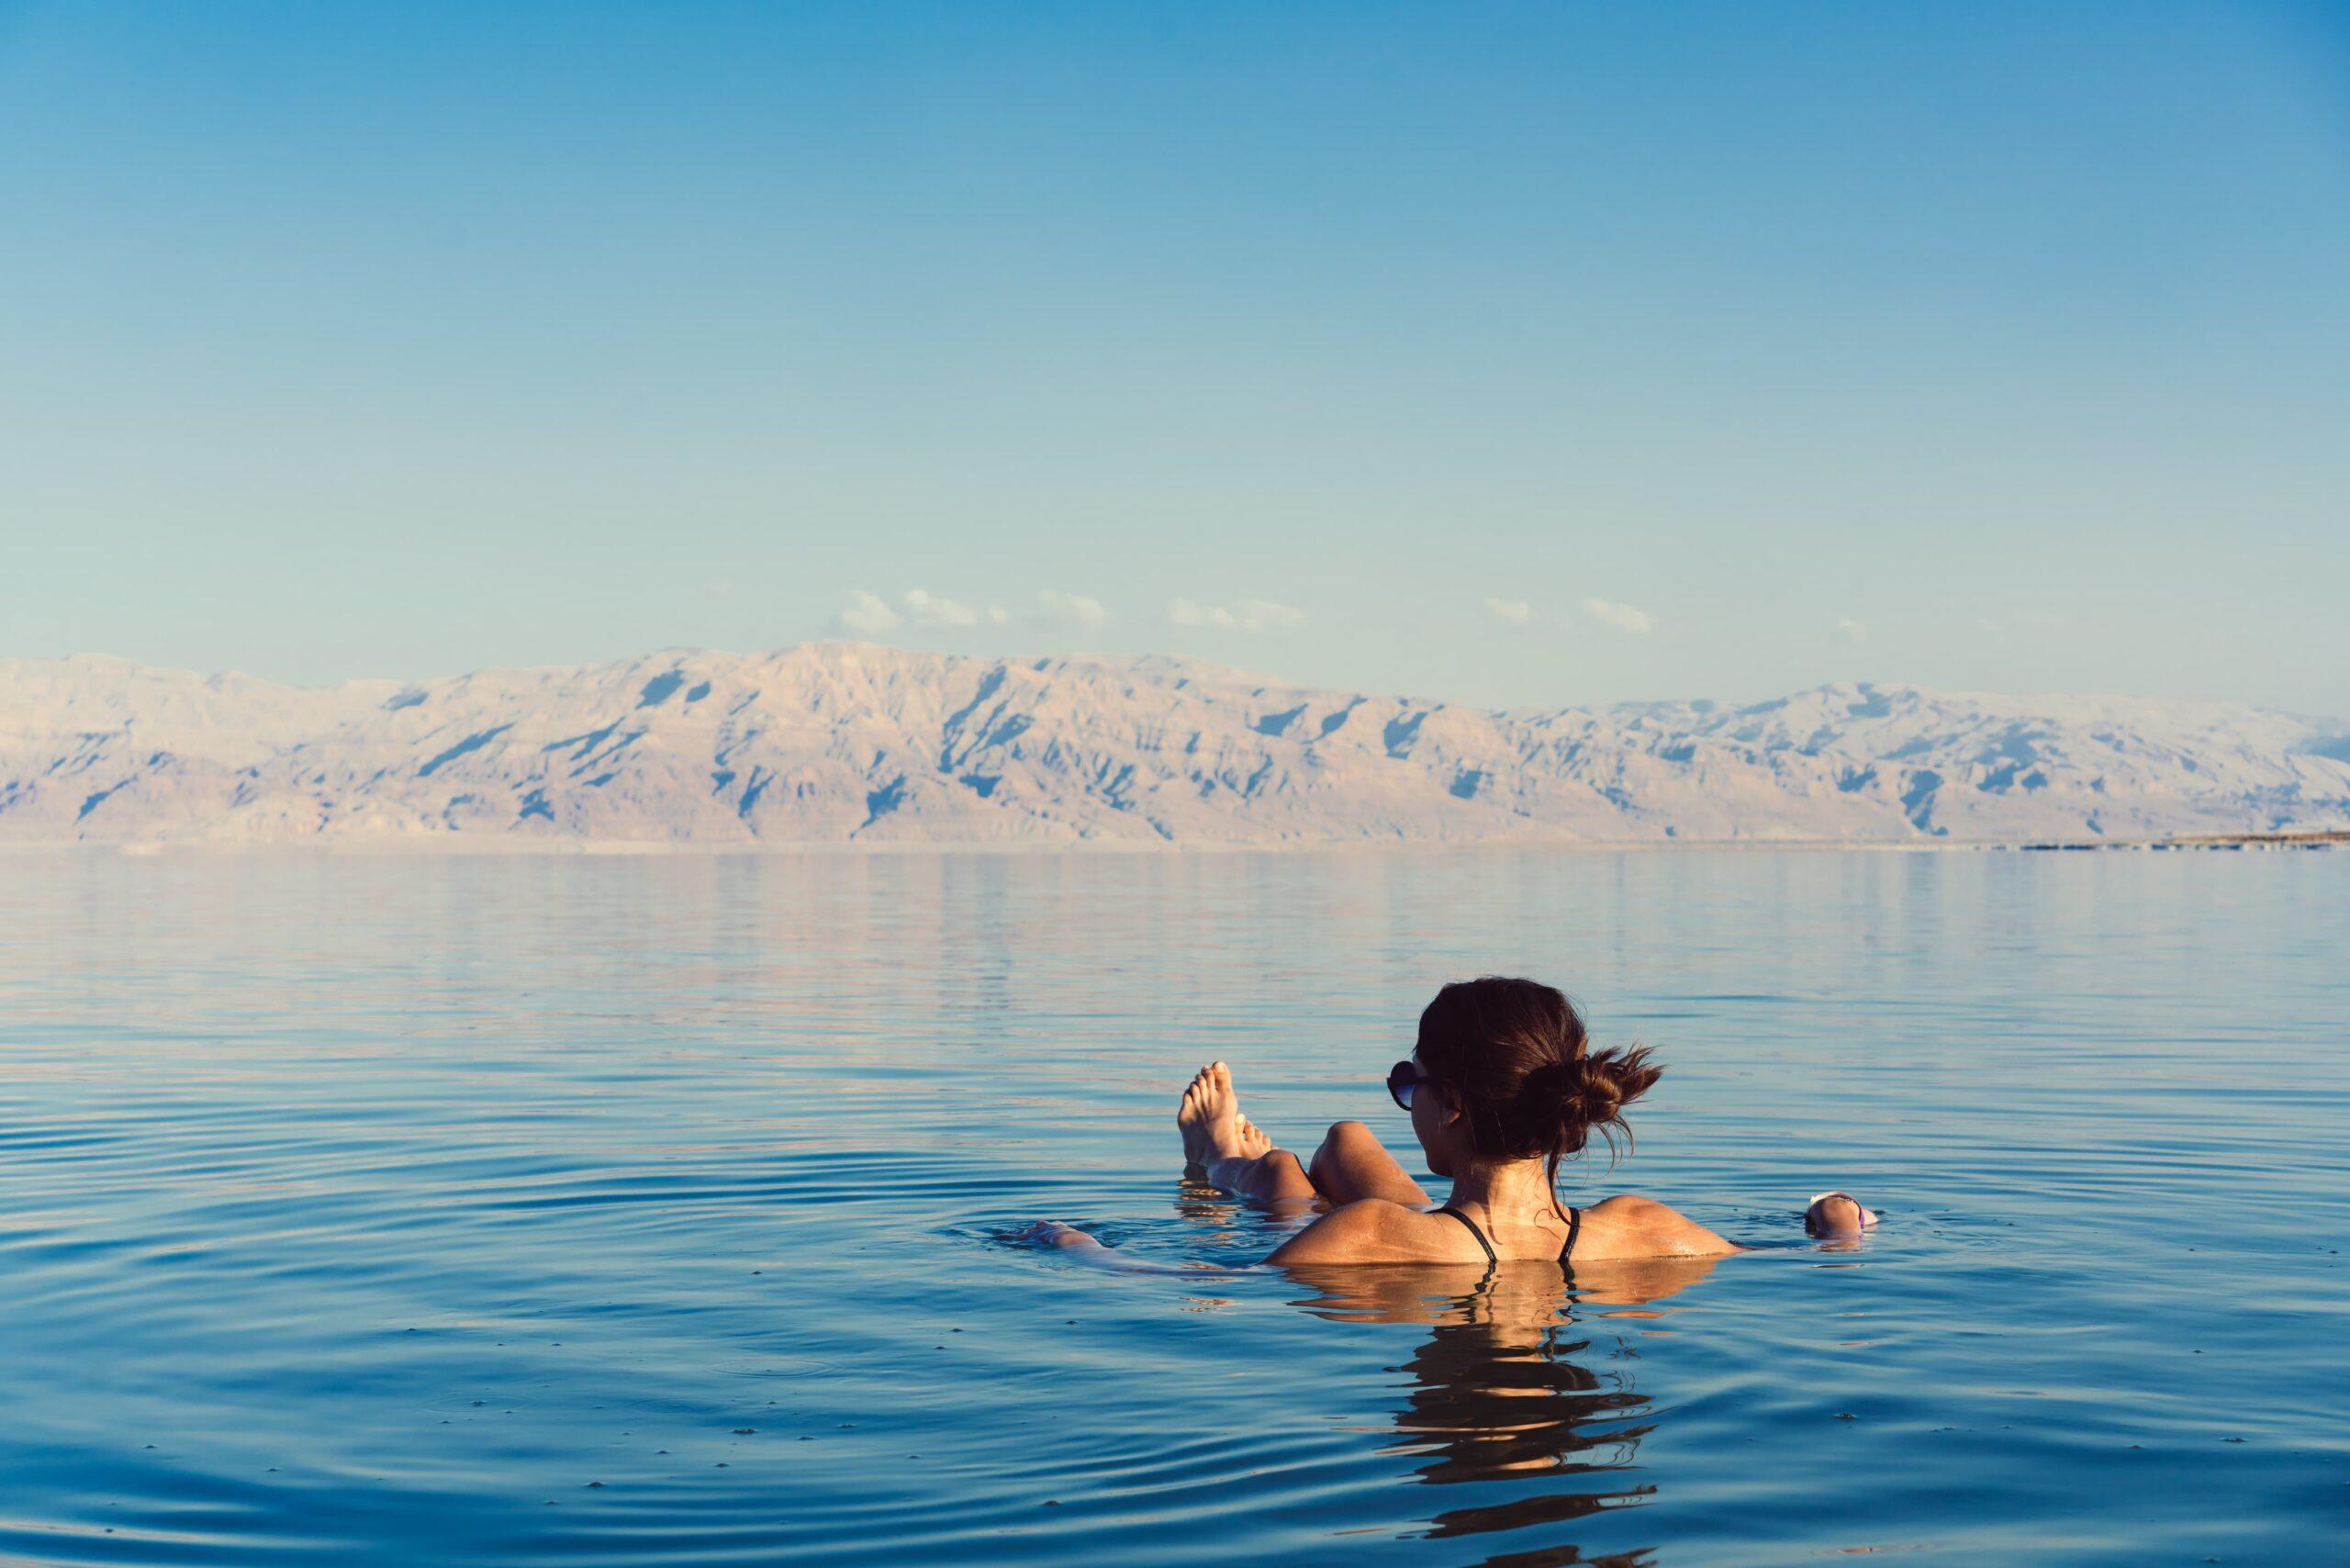 Woman floating in the Dead Sea, Israel